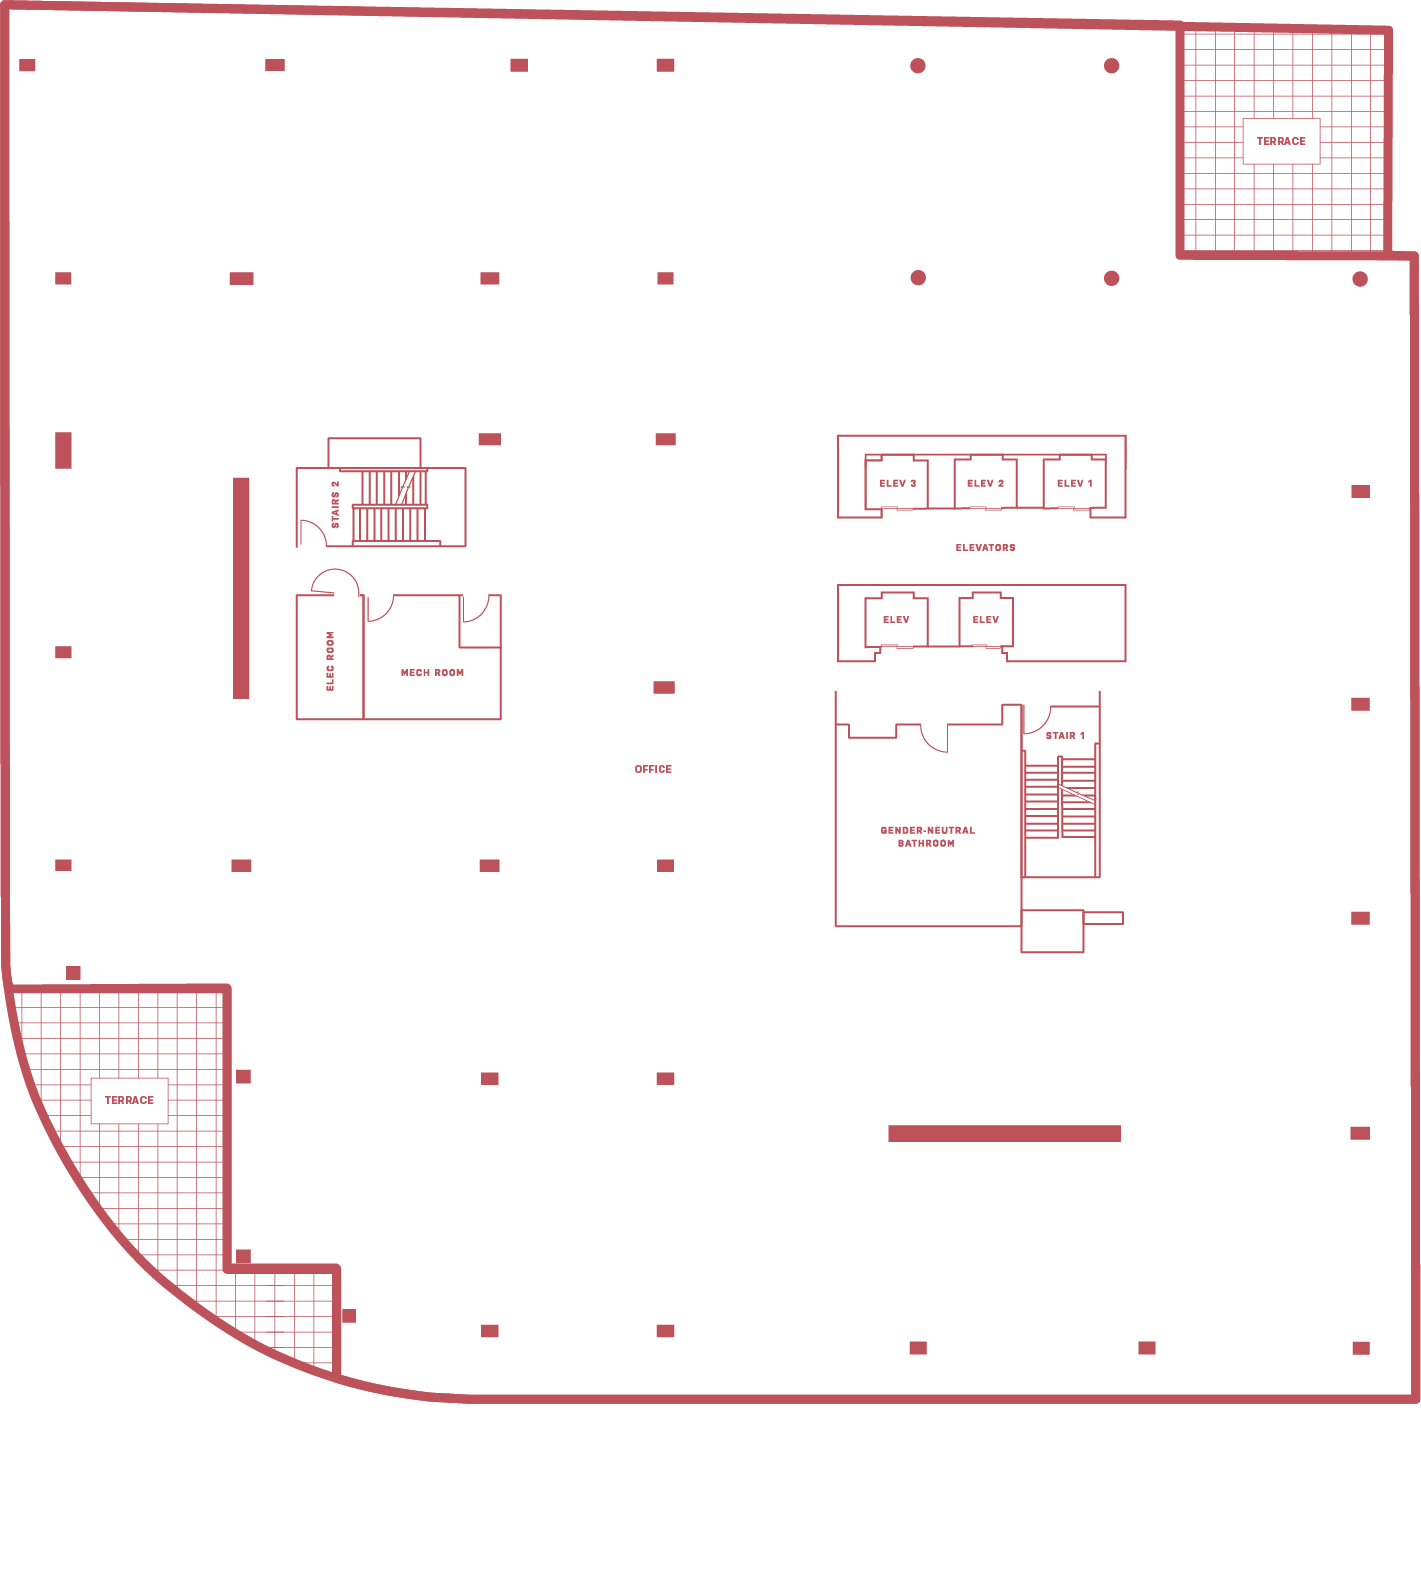 5MLK 3rd floor - floor plan